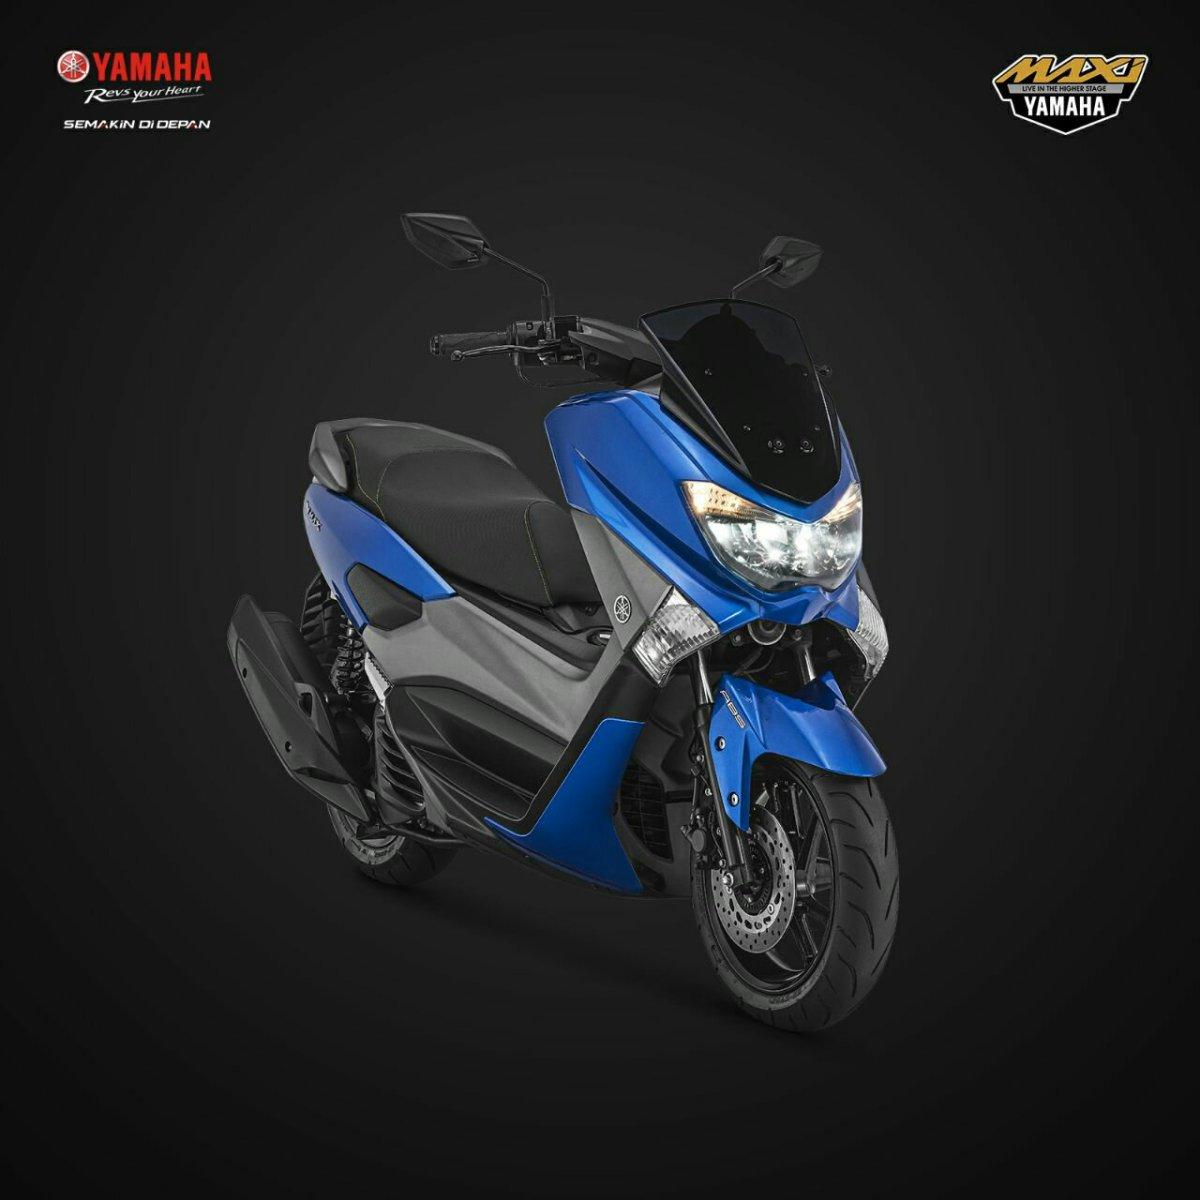 Spesifikasi, harga dan pilihan warna Yamaha NMAX model 2018